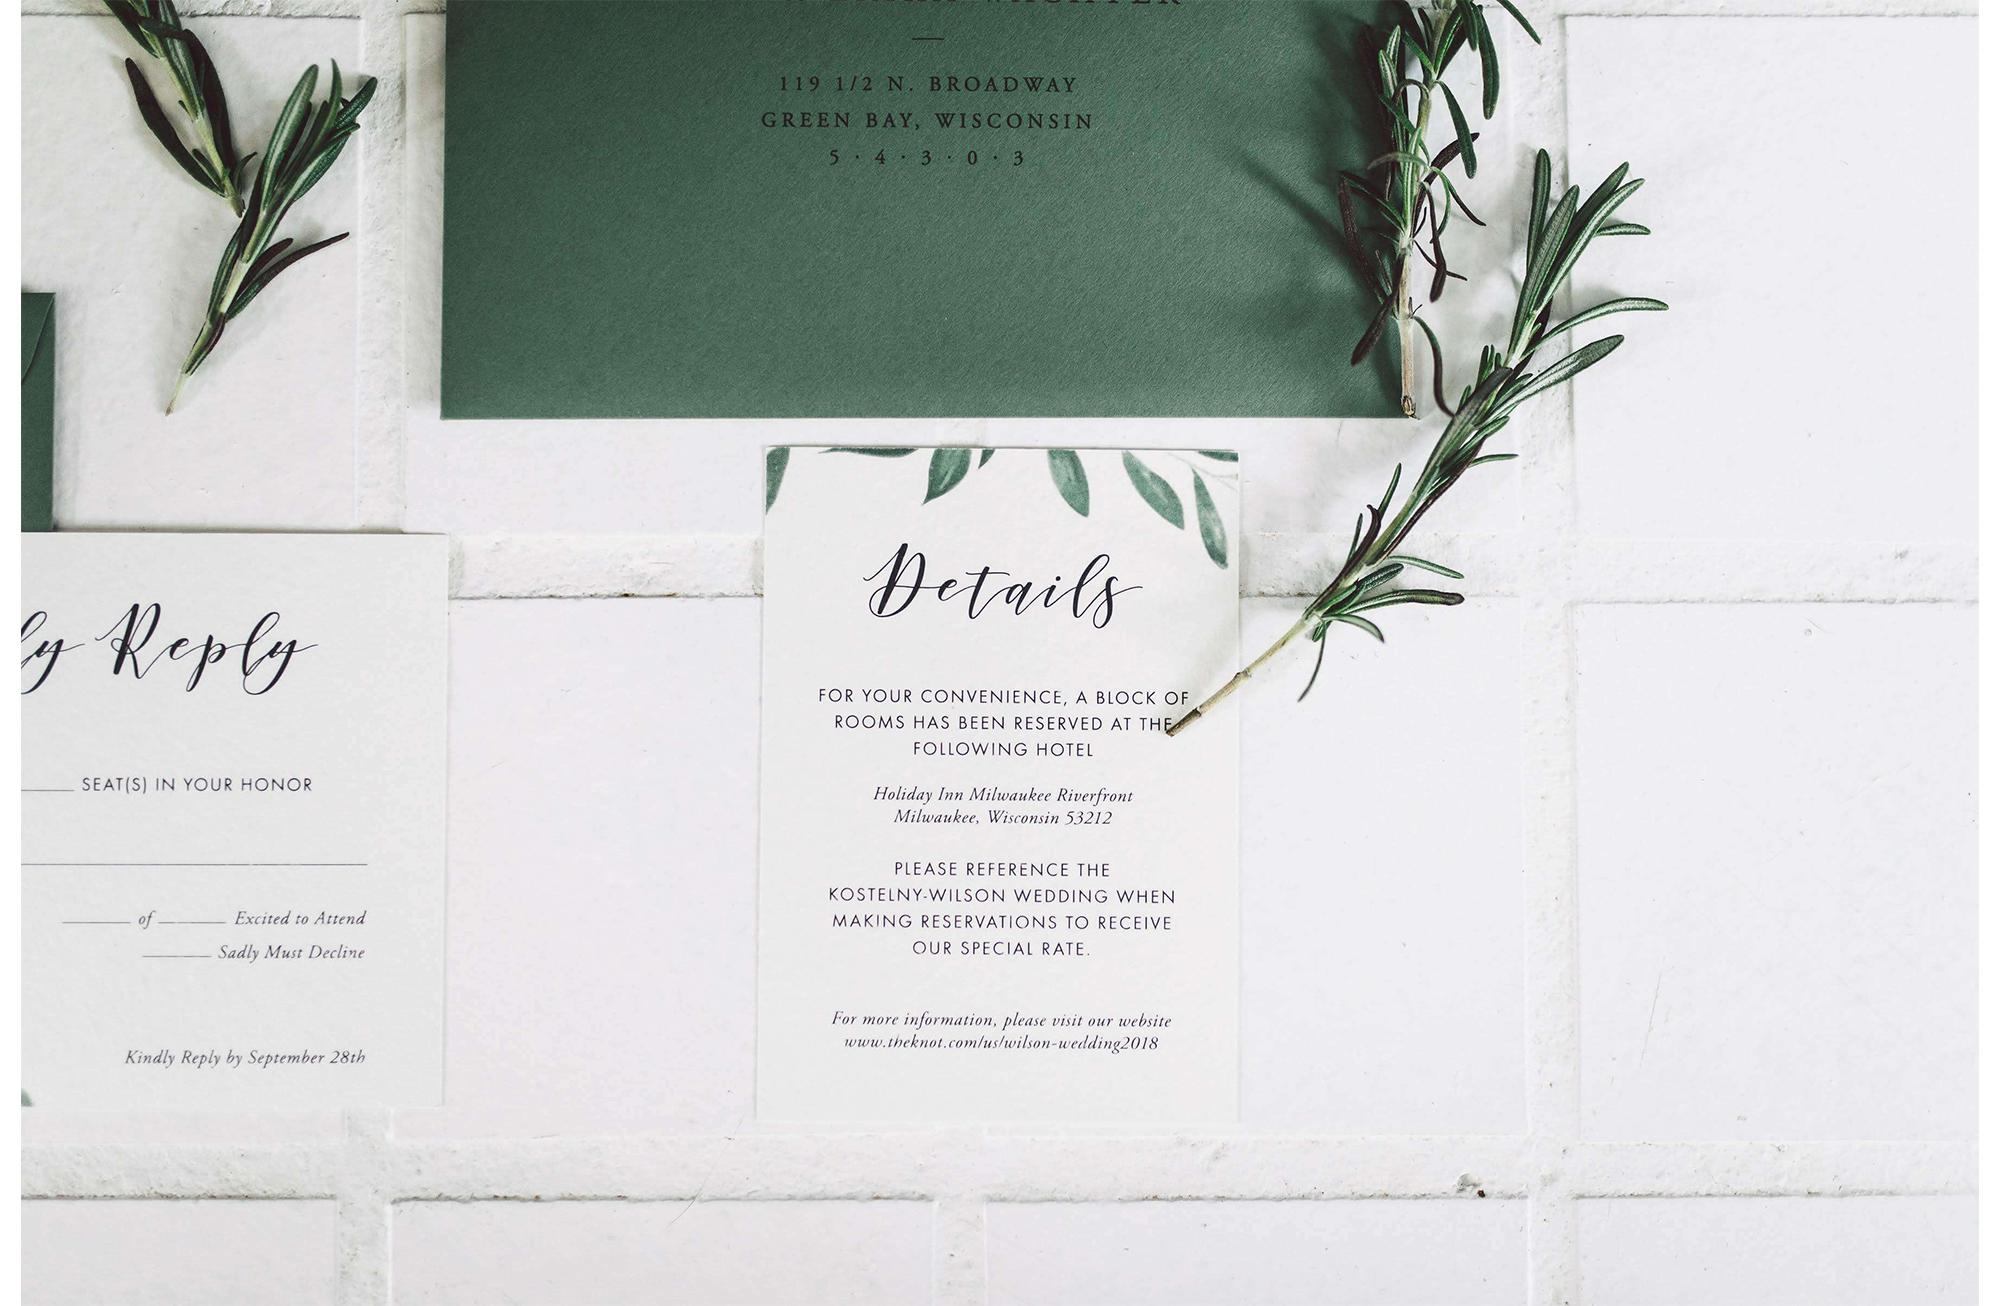 Hall-Creative-Co-custom-Milwaukee-Wedding-stationery-The-Atrium.jpg